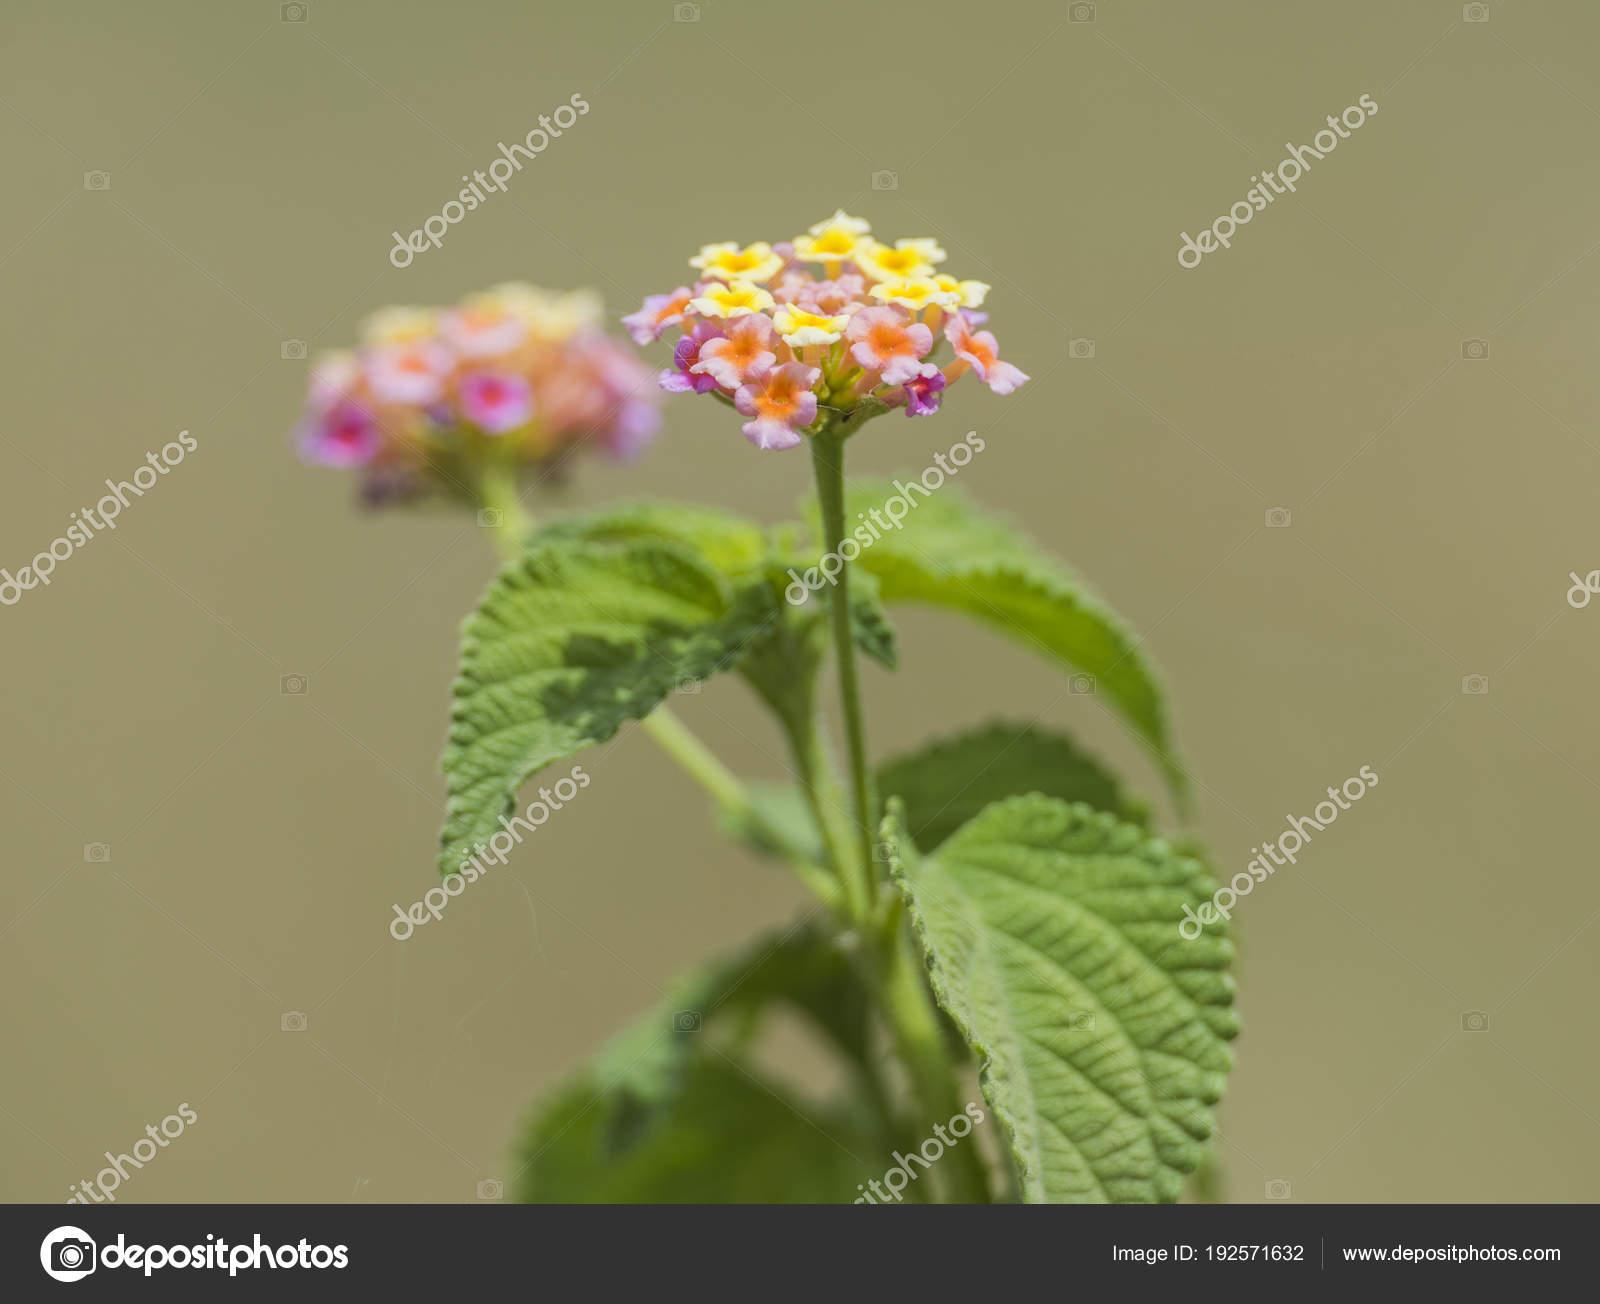 Closeup Of Rose Lantana Flower In Rural Garden Setting Stock Photo